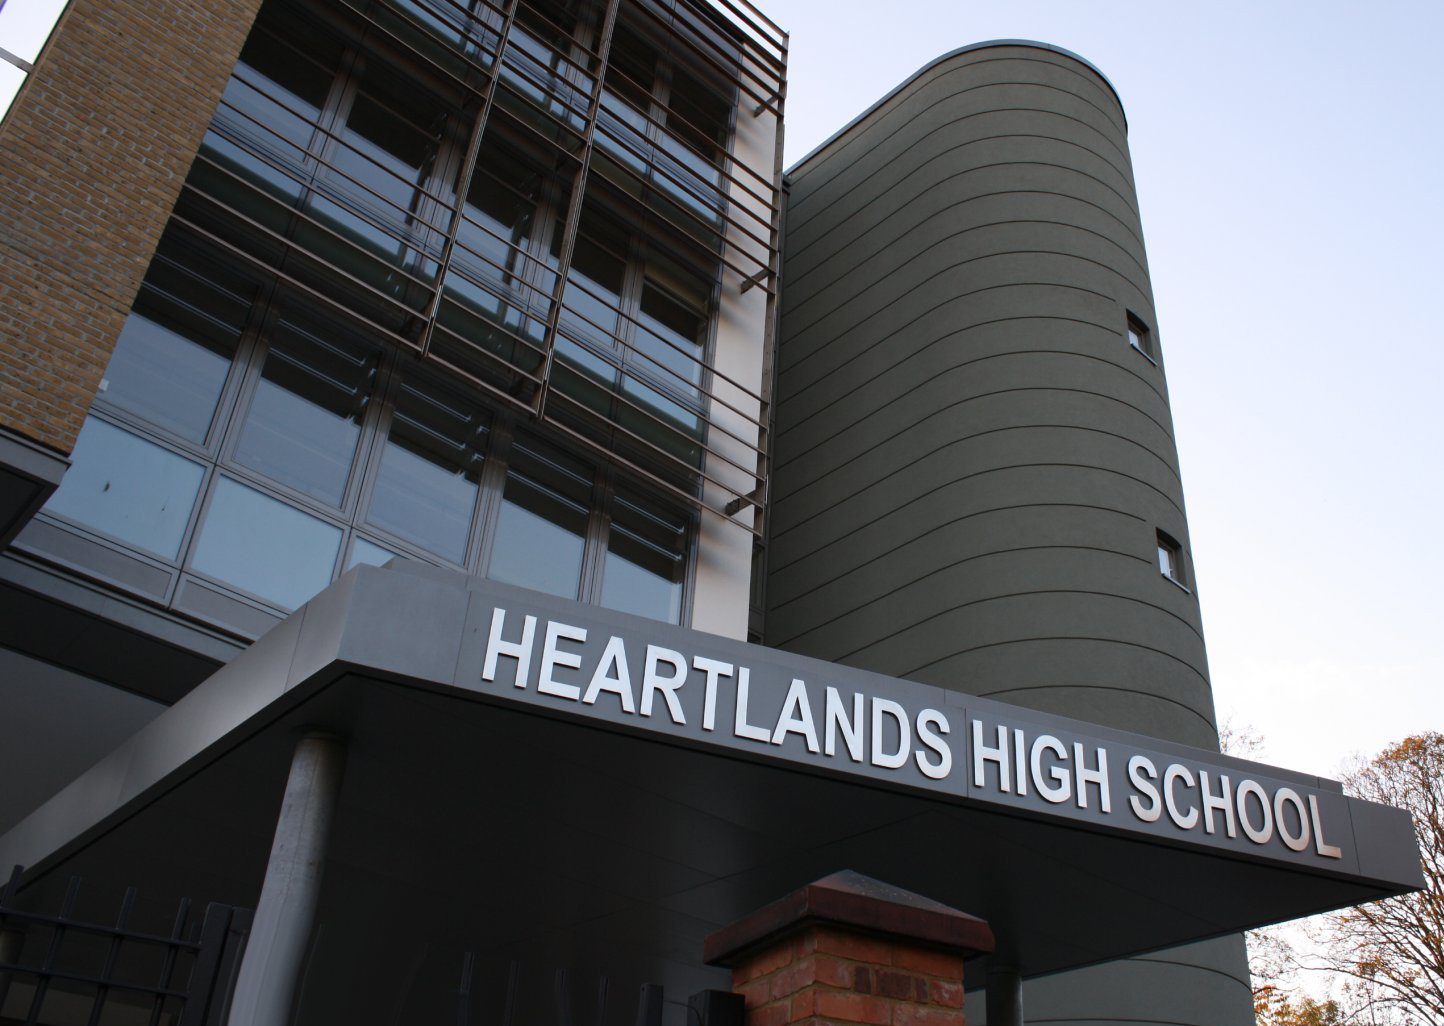 heartlands-image-2